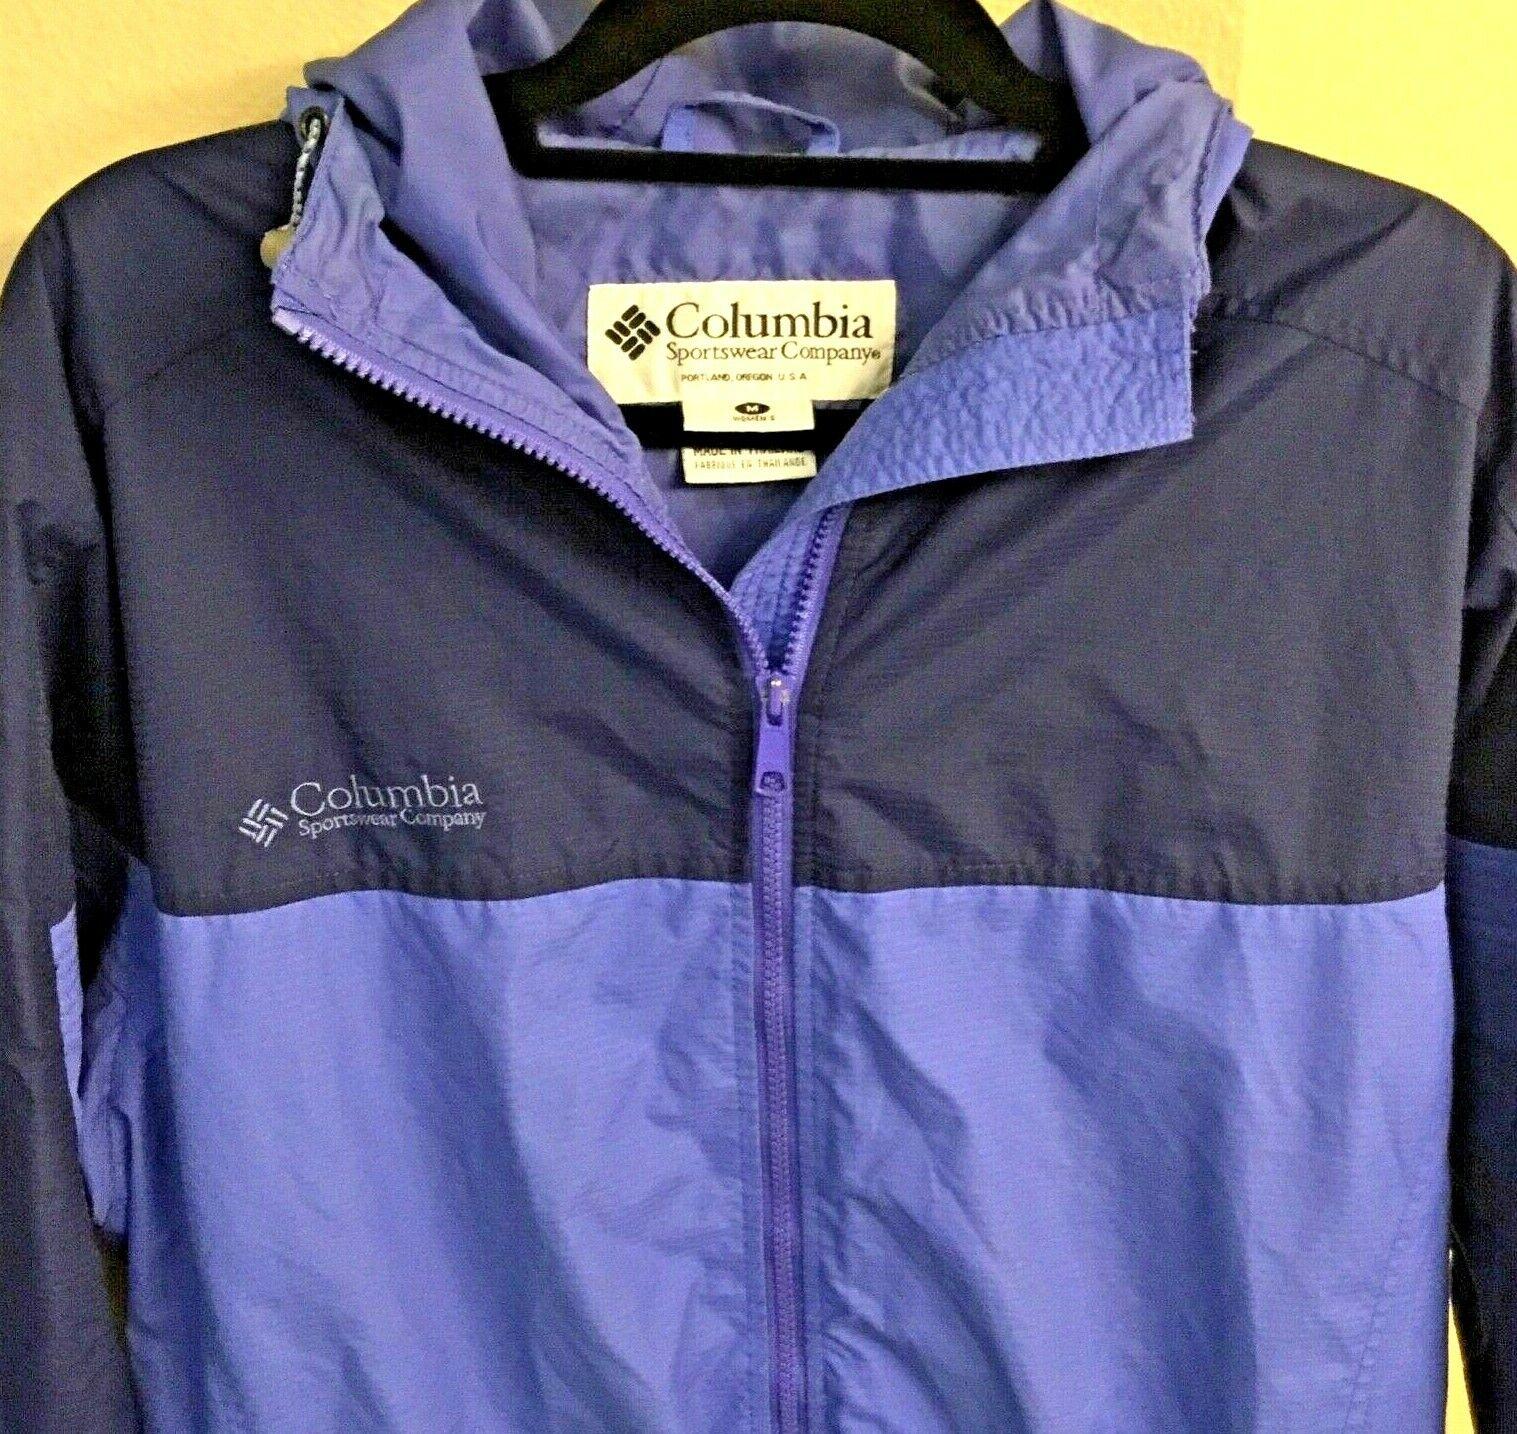 WOMEN'S MEDIUM COLUMBIA HIKING JACKET Full Zip Hooded Outdoor Trail Ski Coat